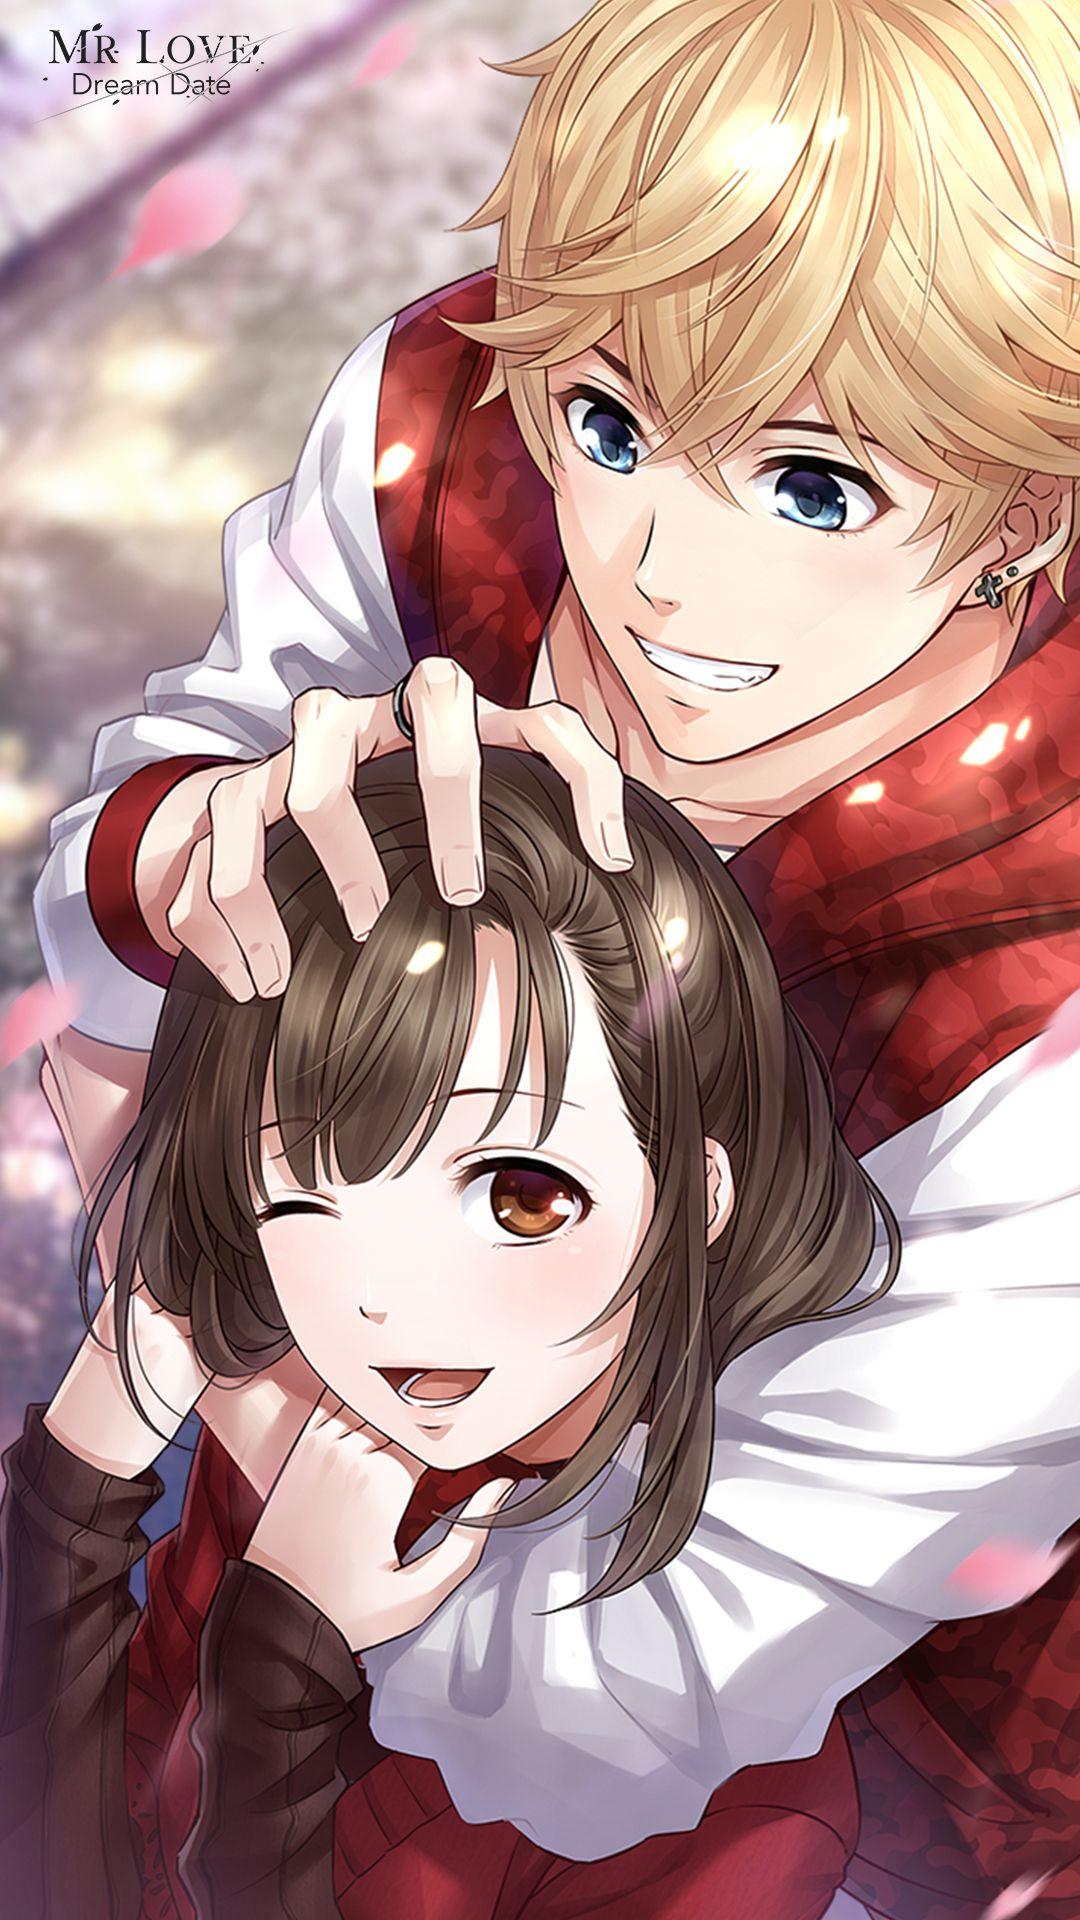 Anime Cool Guy Wallpaper Hd